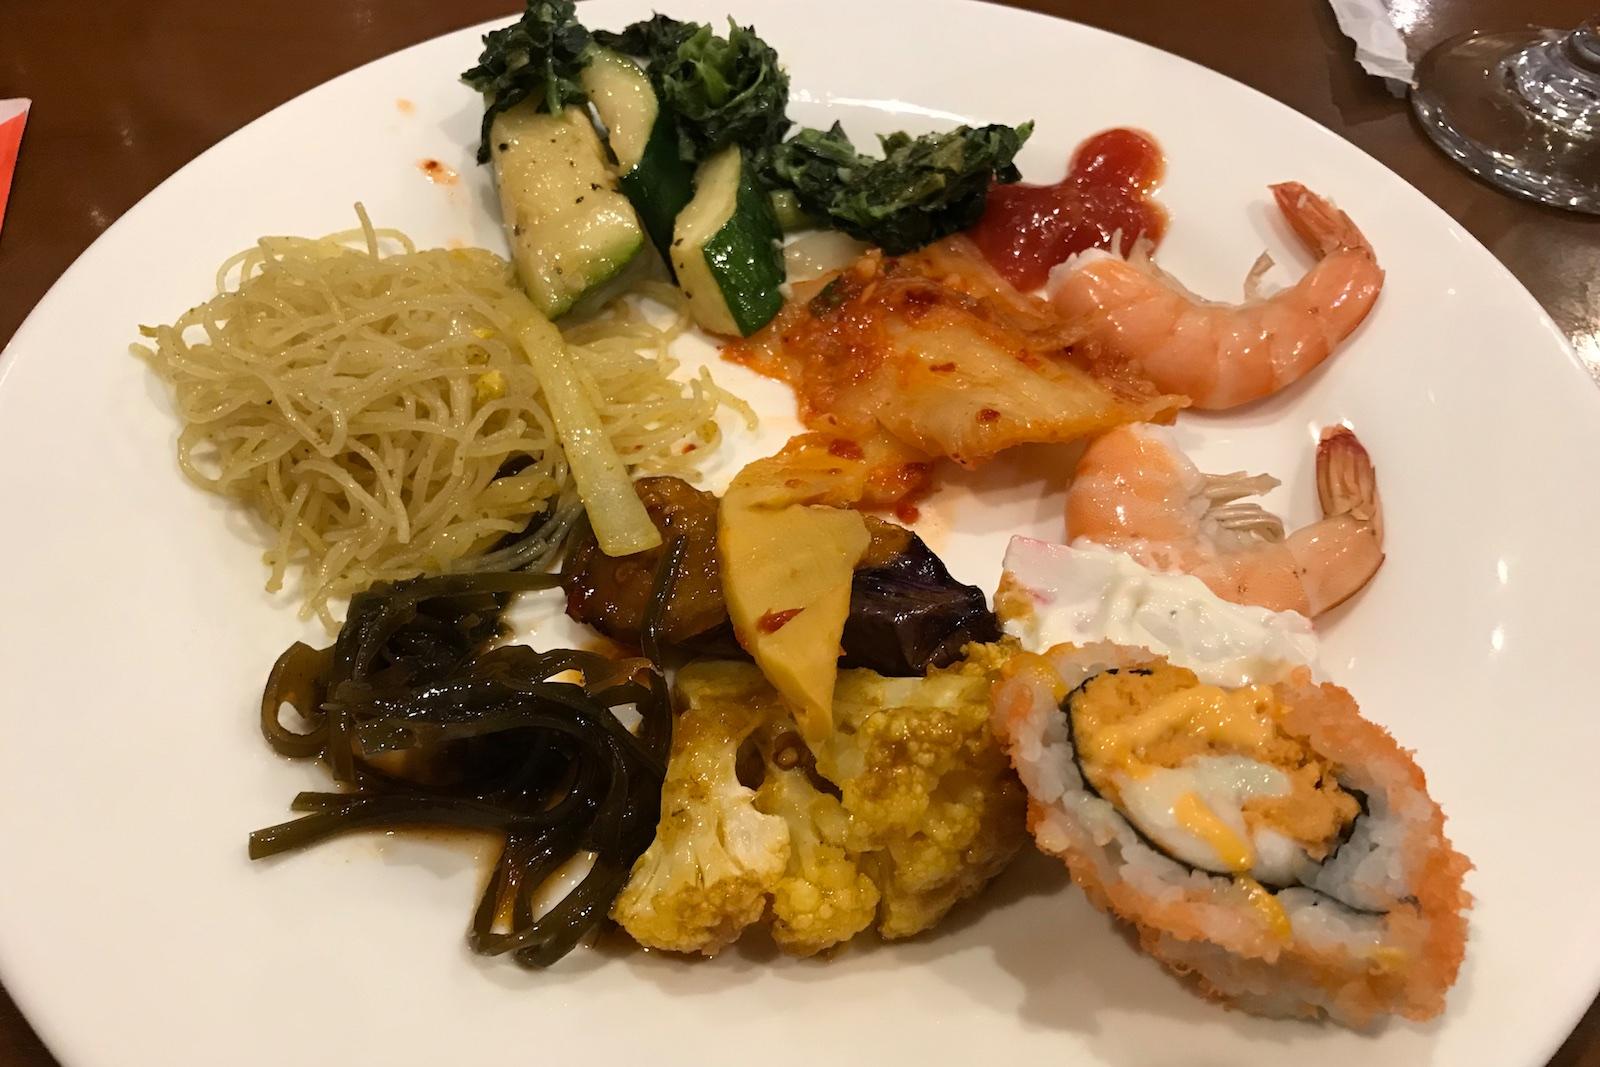 http://blog.rickk.com/food/2017/12/24/ate.2017.12.23.d1.jpg